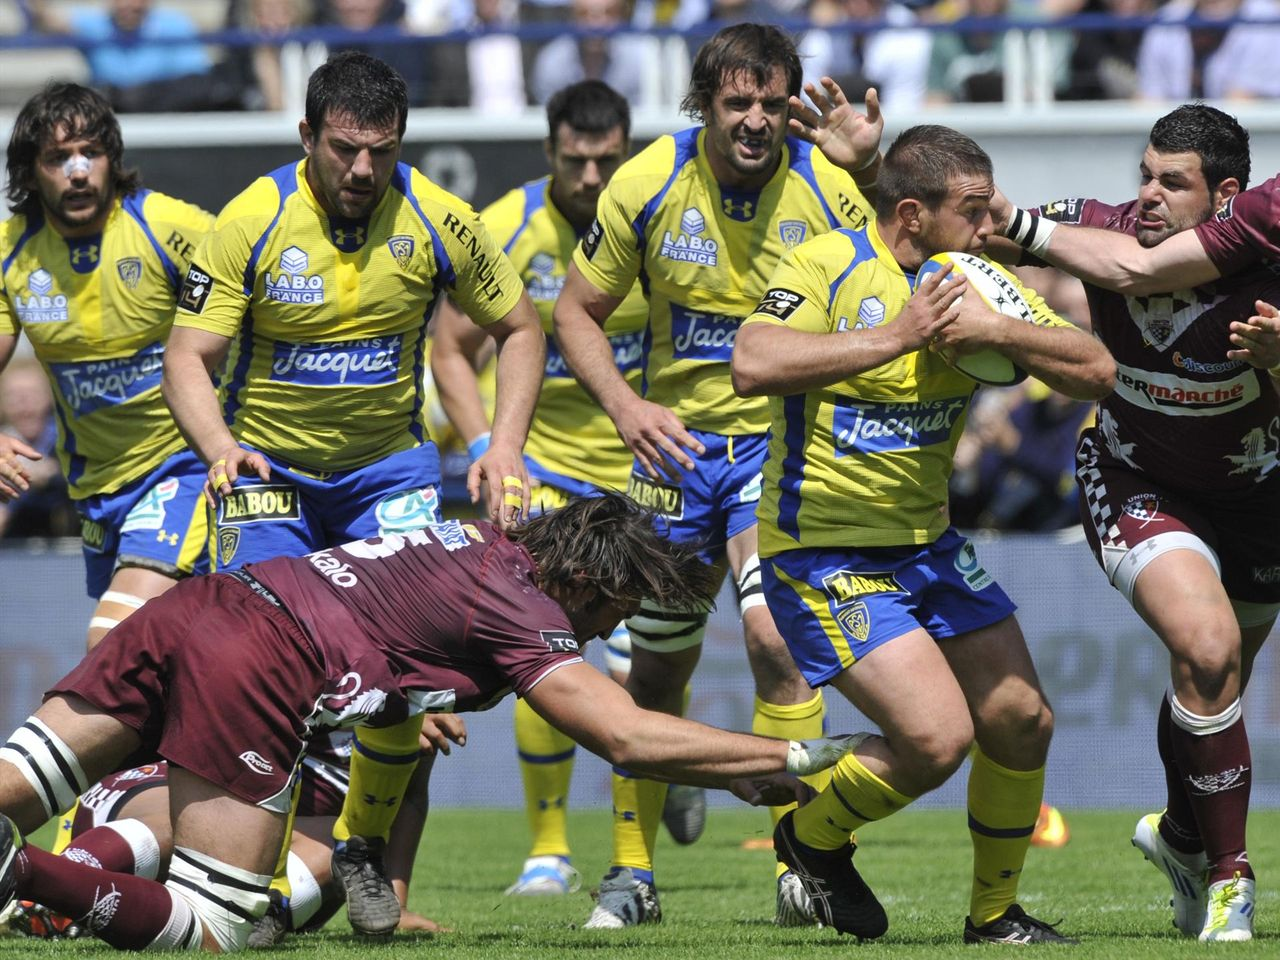 Clermont extend winning streak to 60 - Eurosport